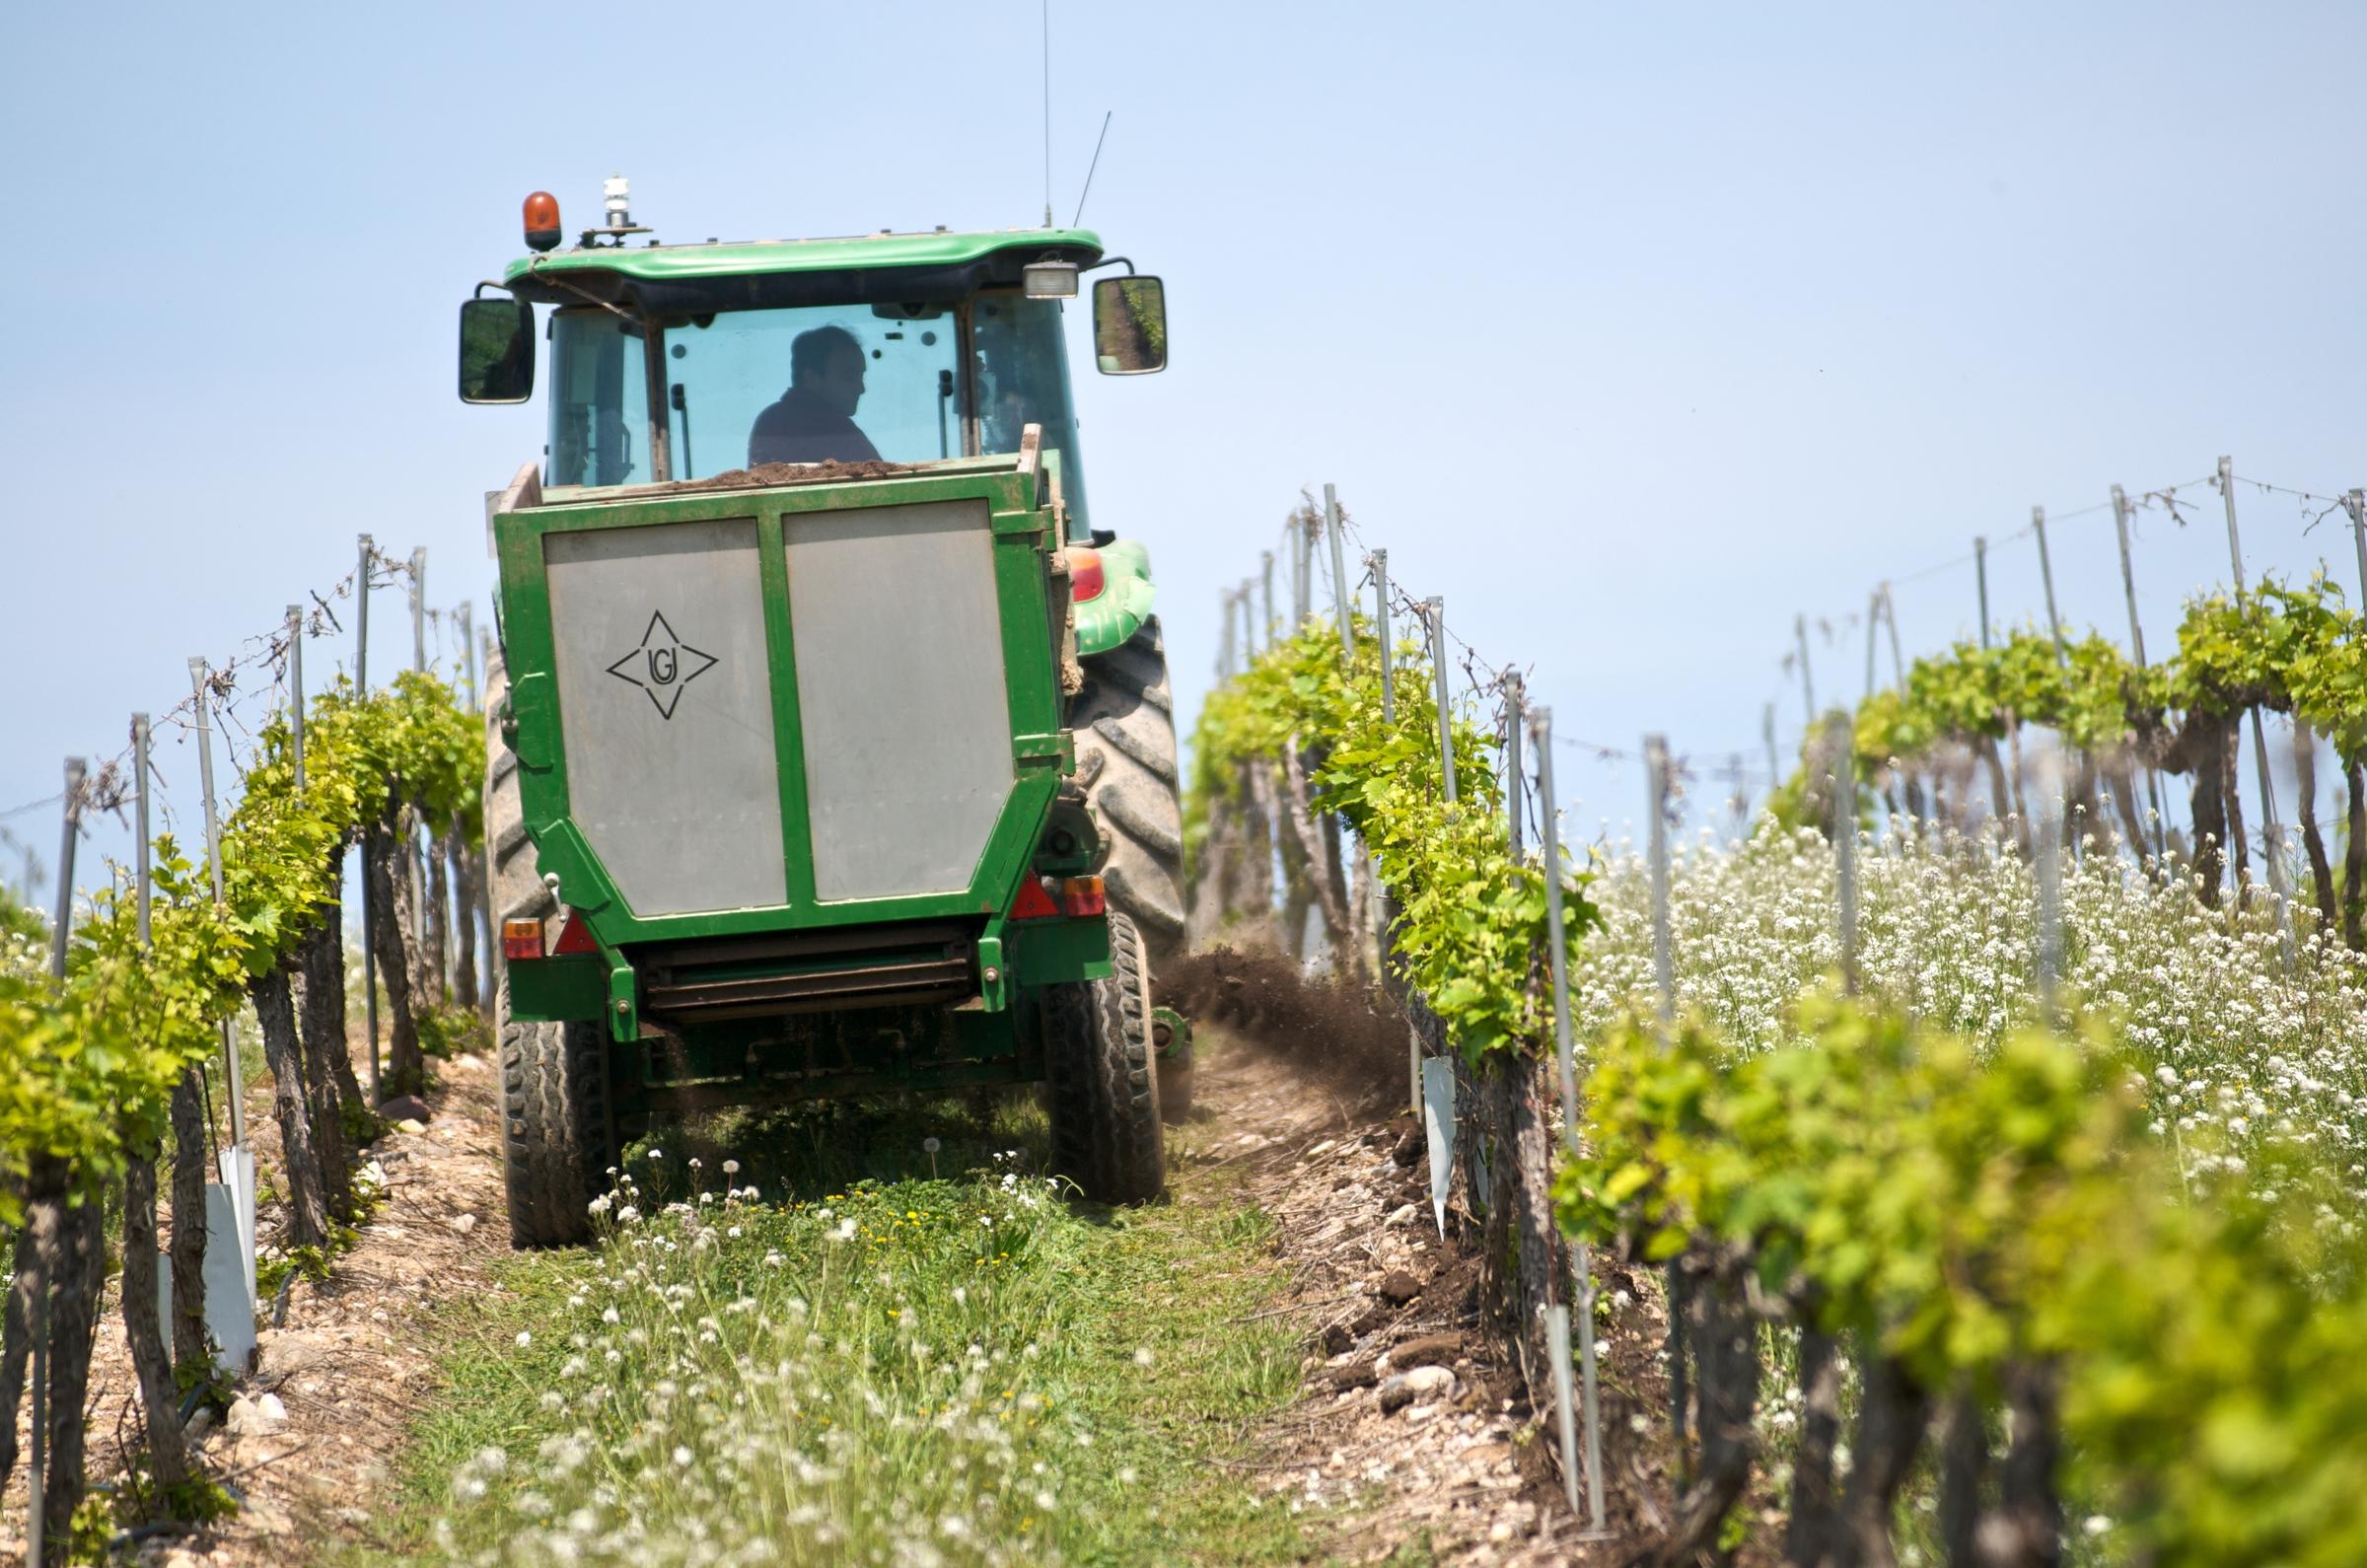 Sustainable wine farming, Raimat, Lleida, Spain